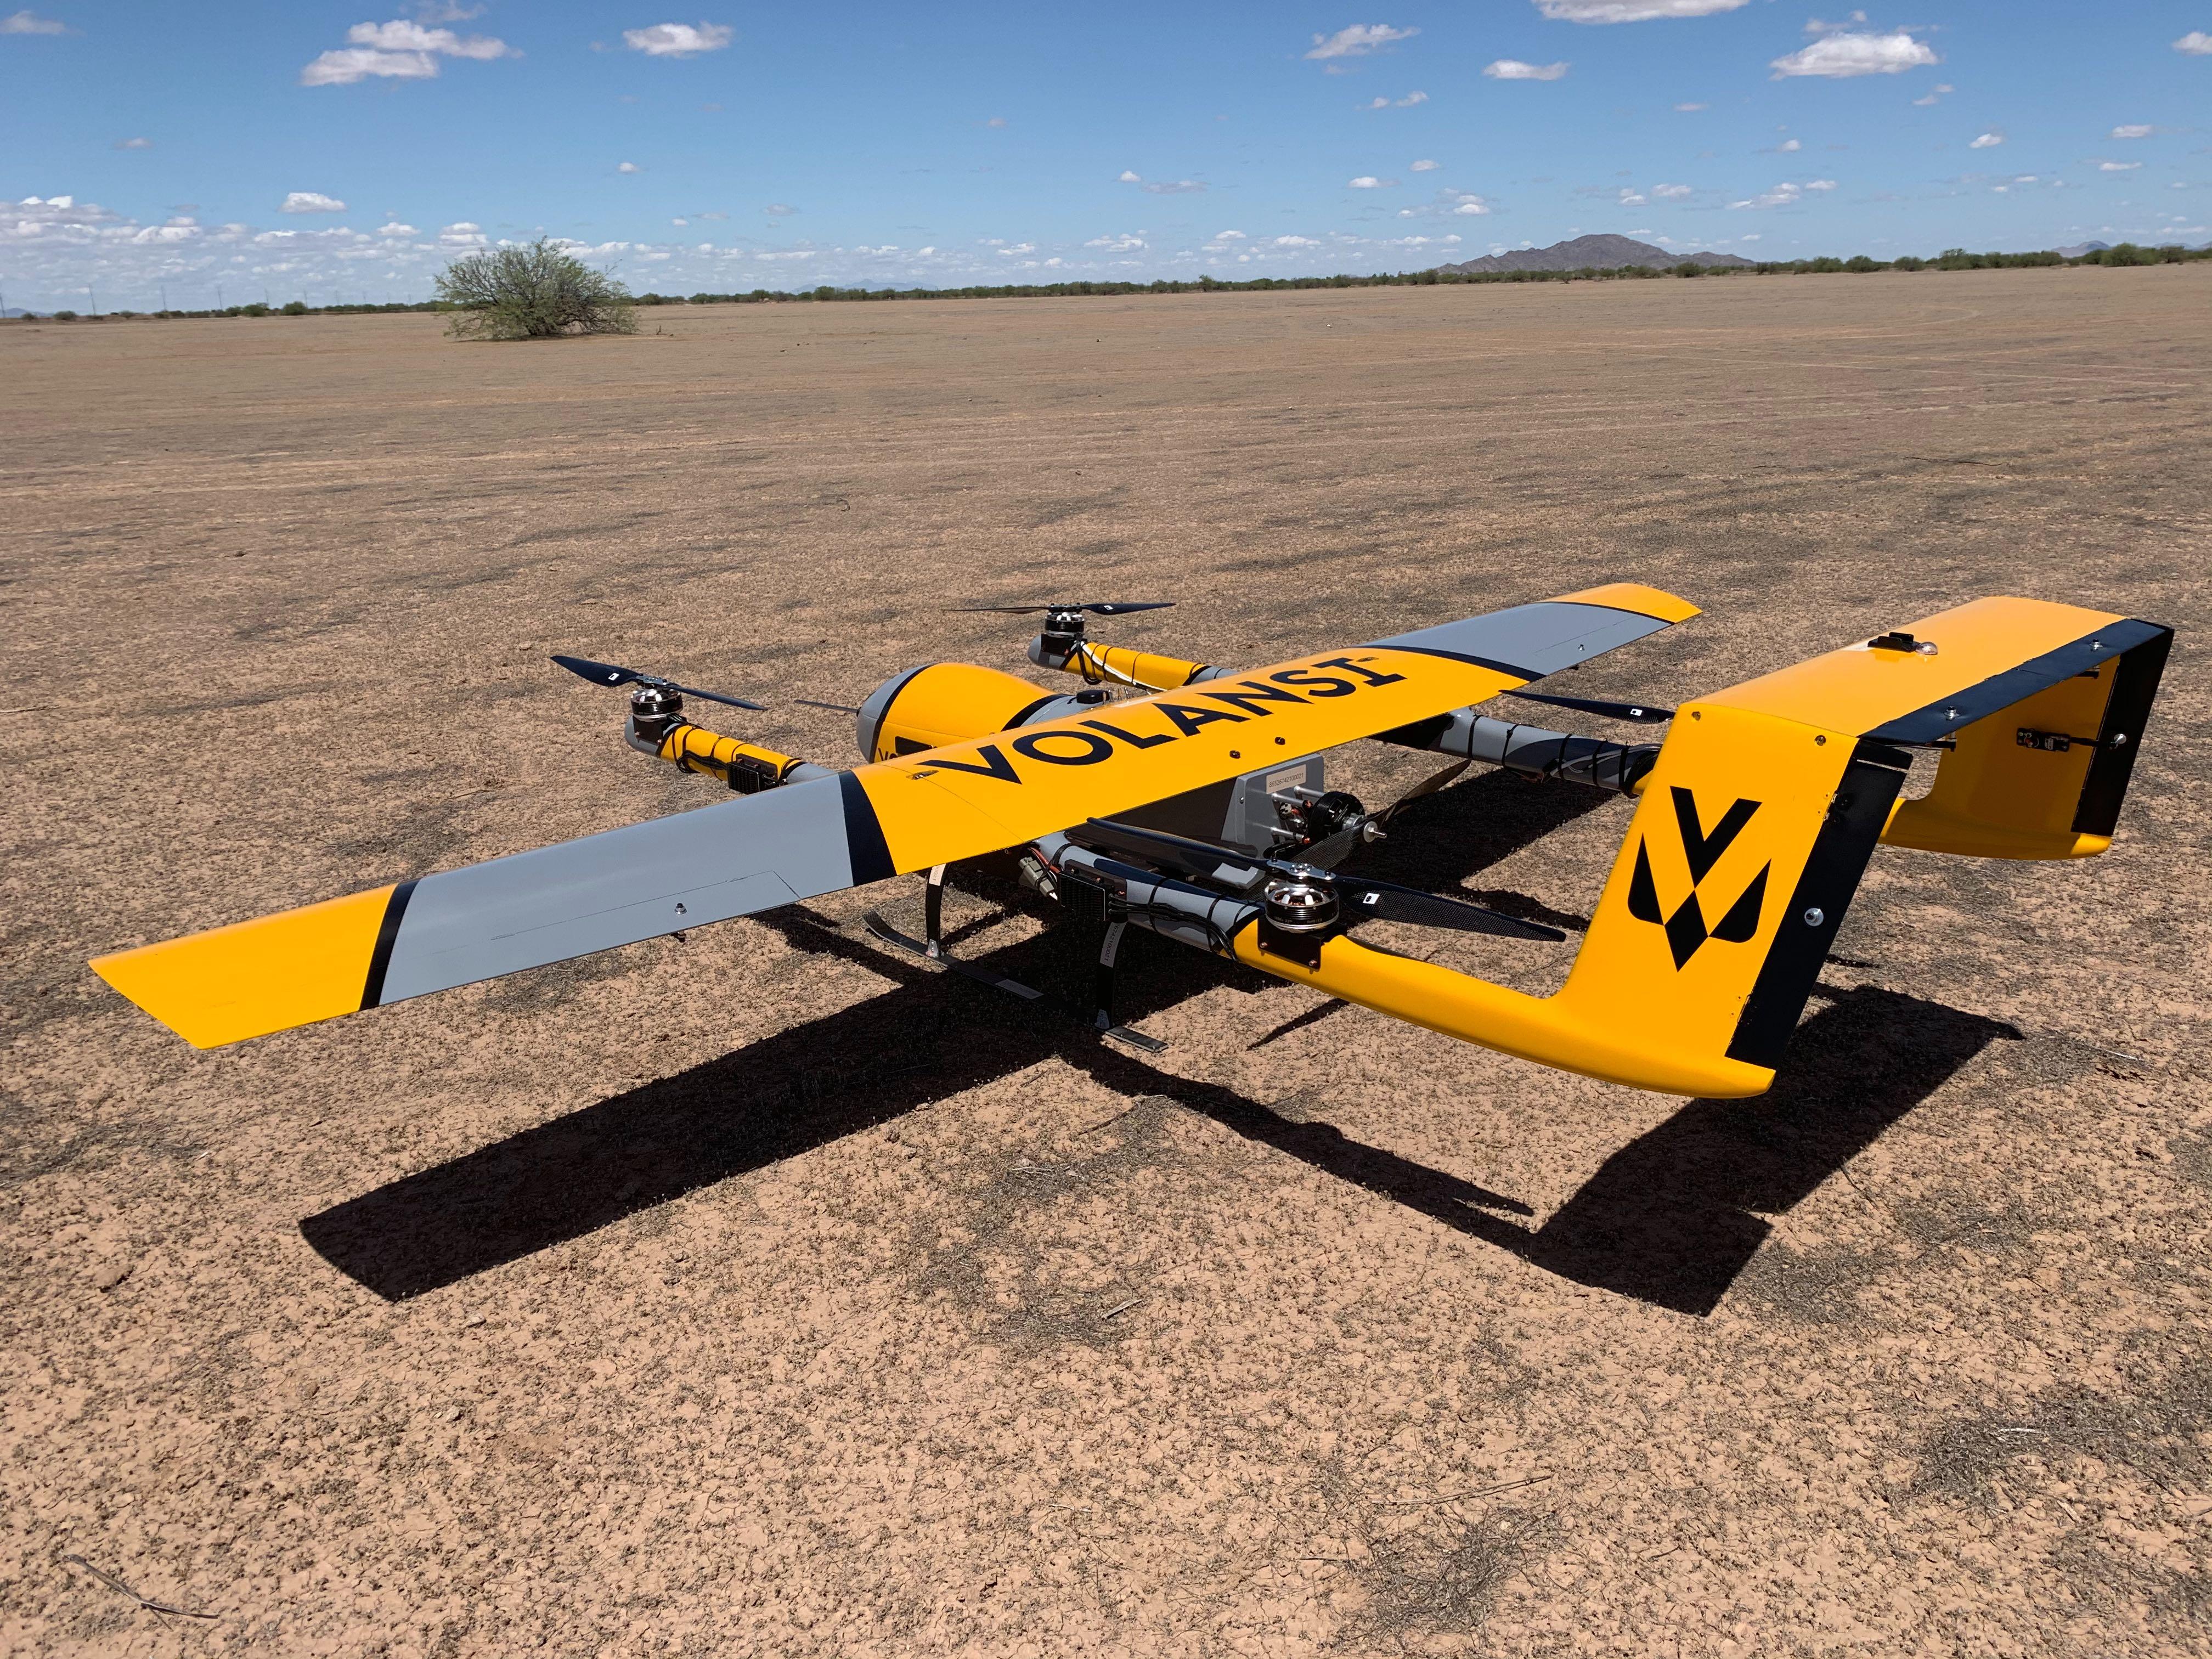 volansi drone